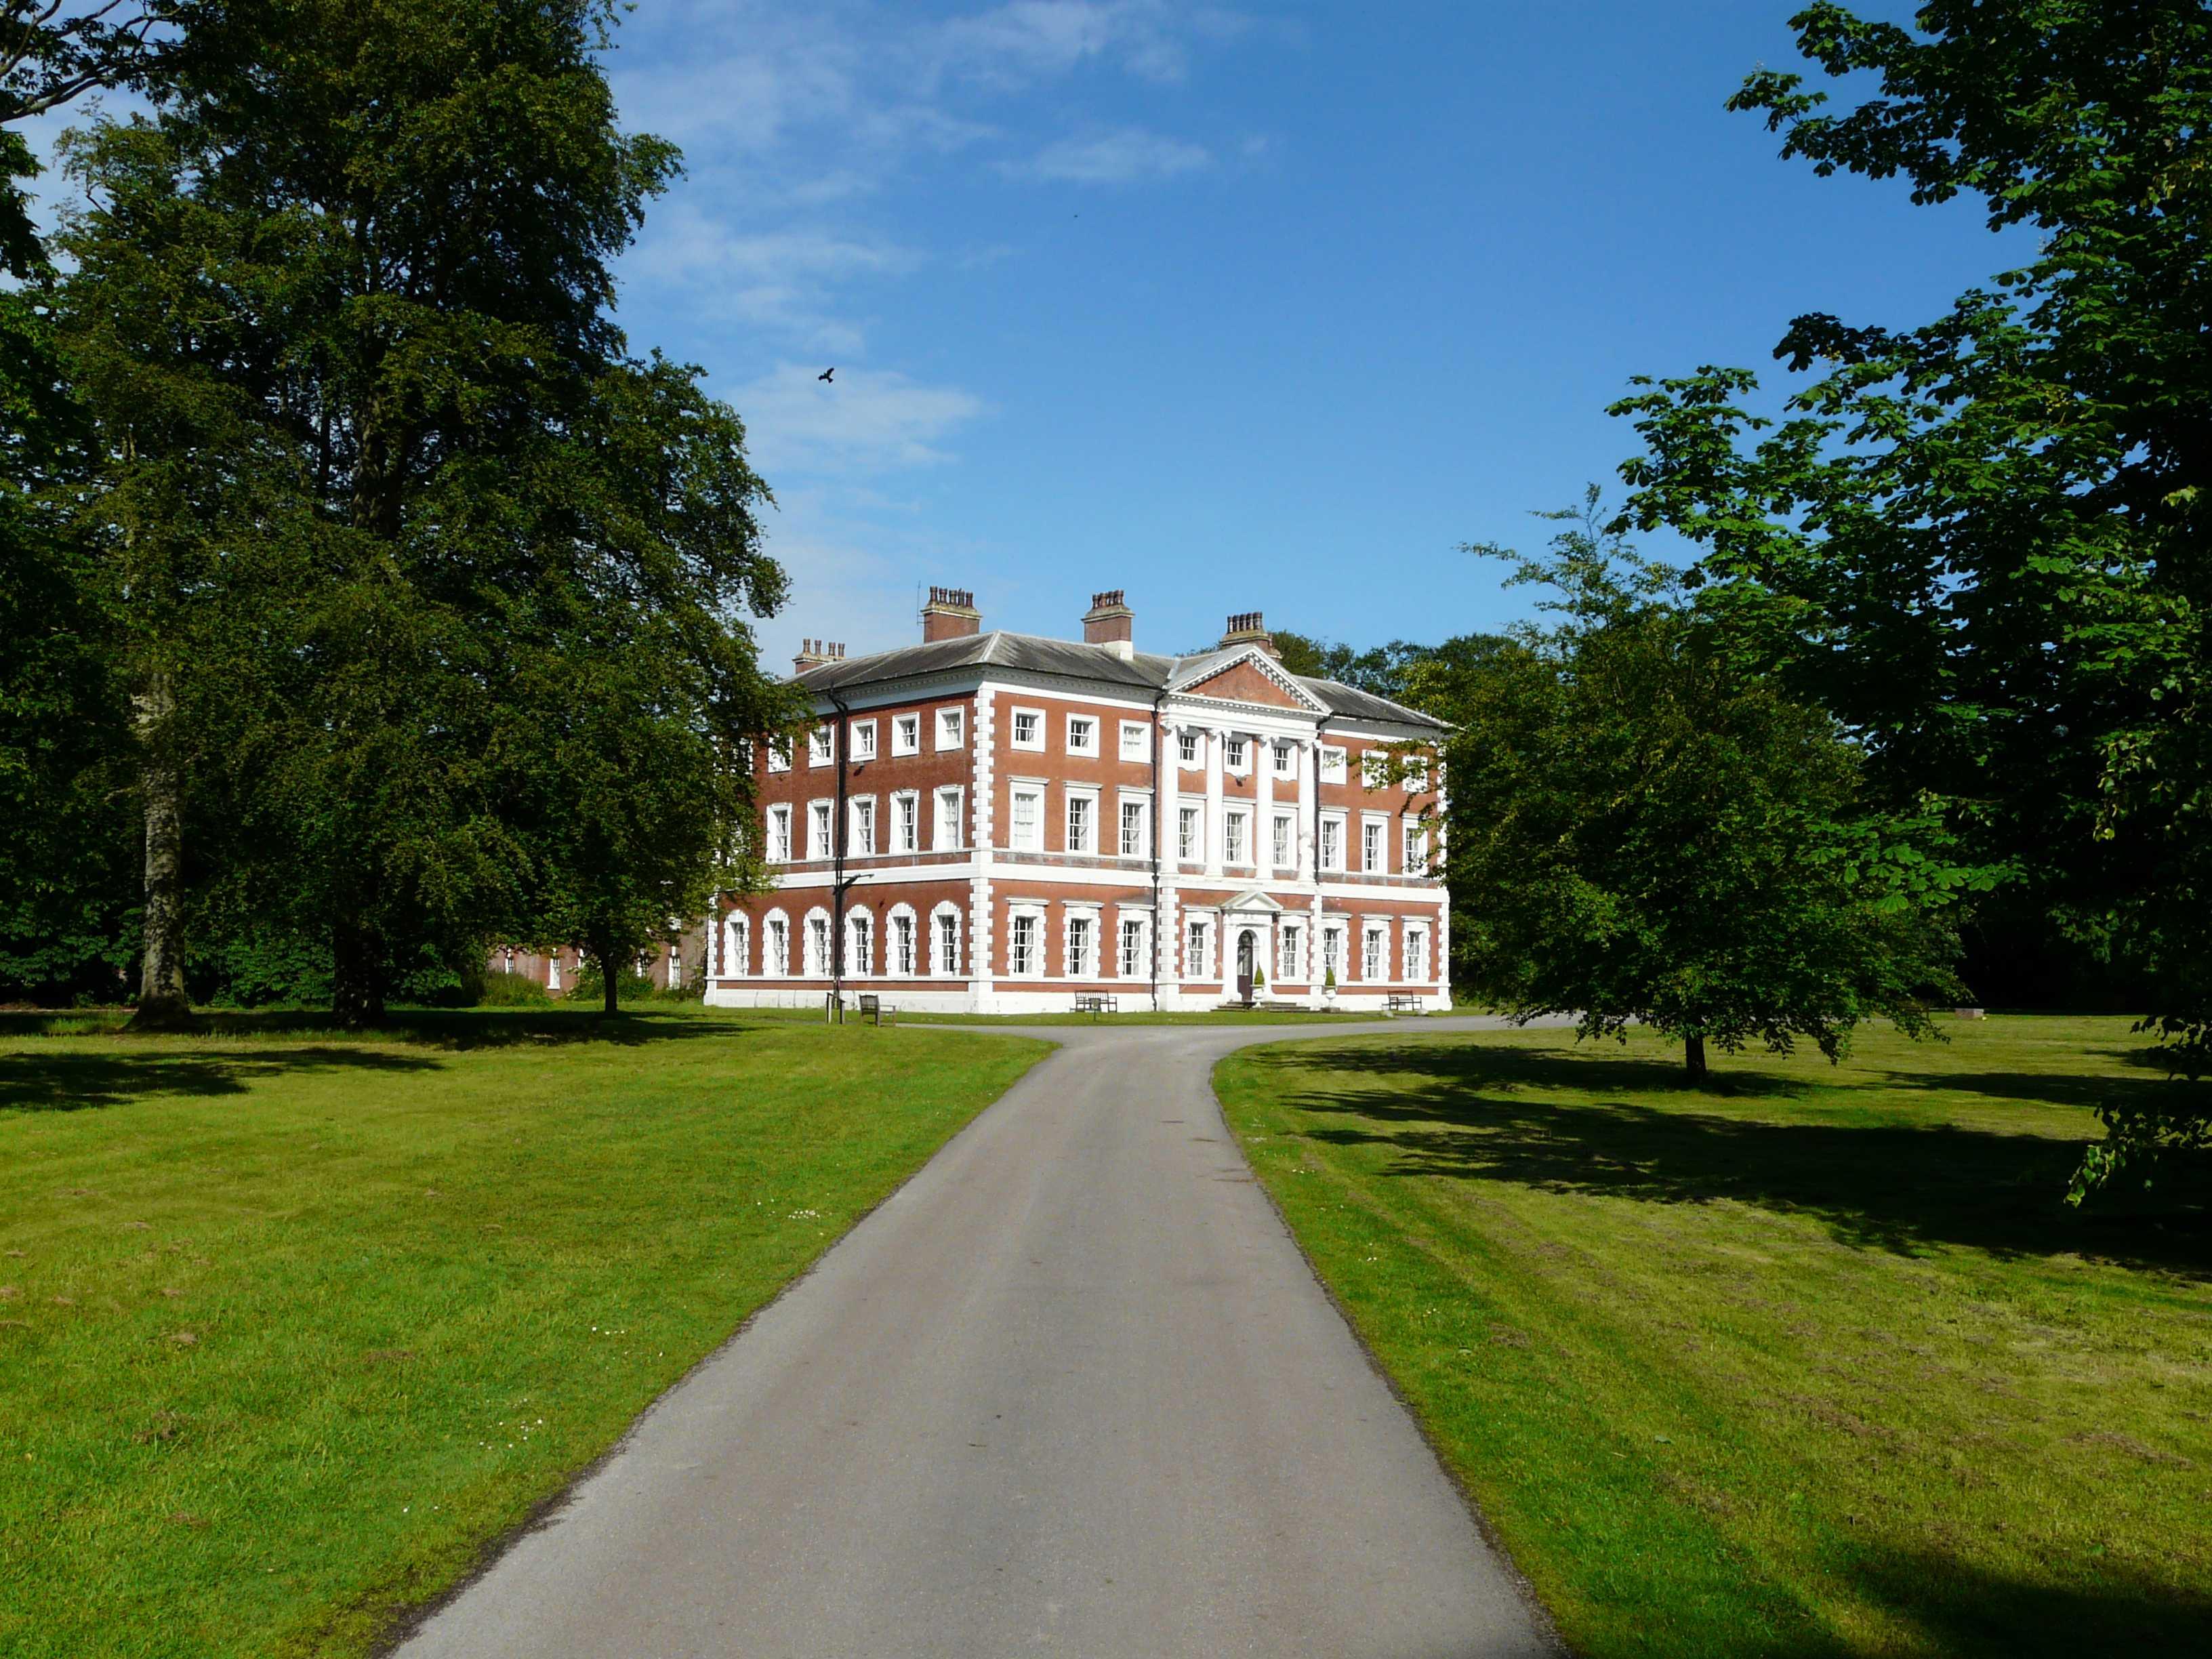 Lytham Hall, Lancashire, England